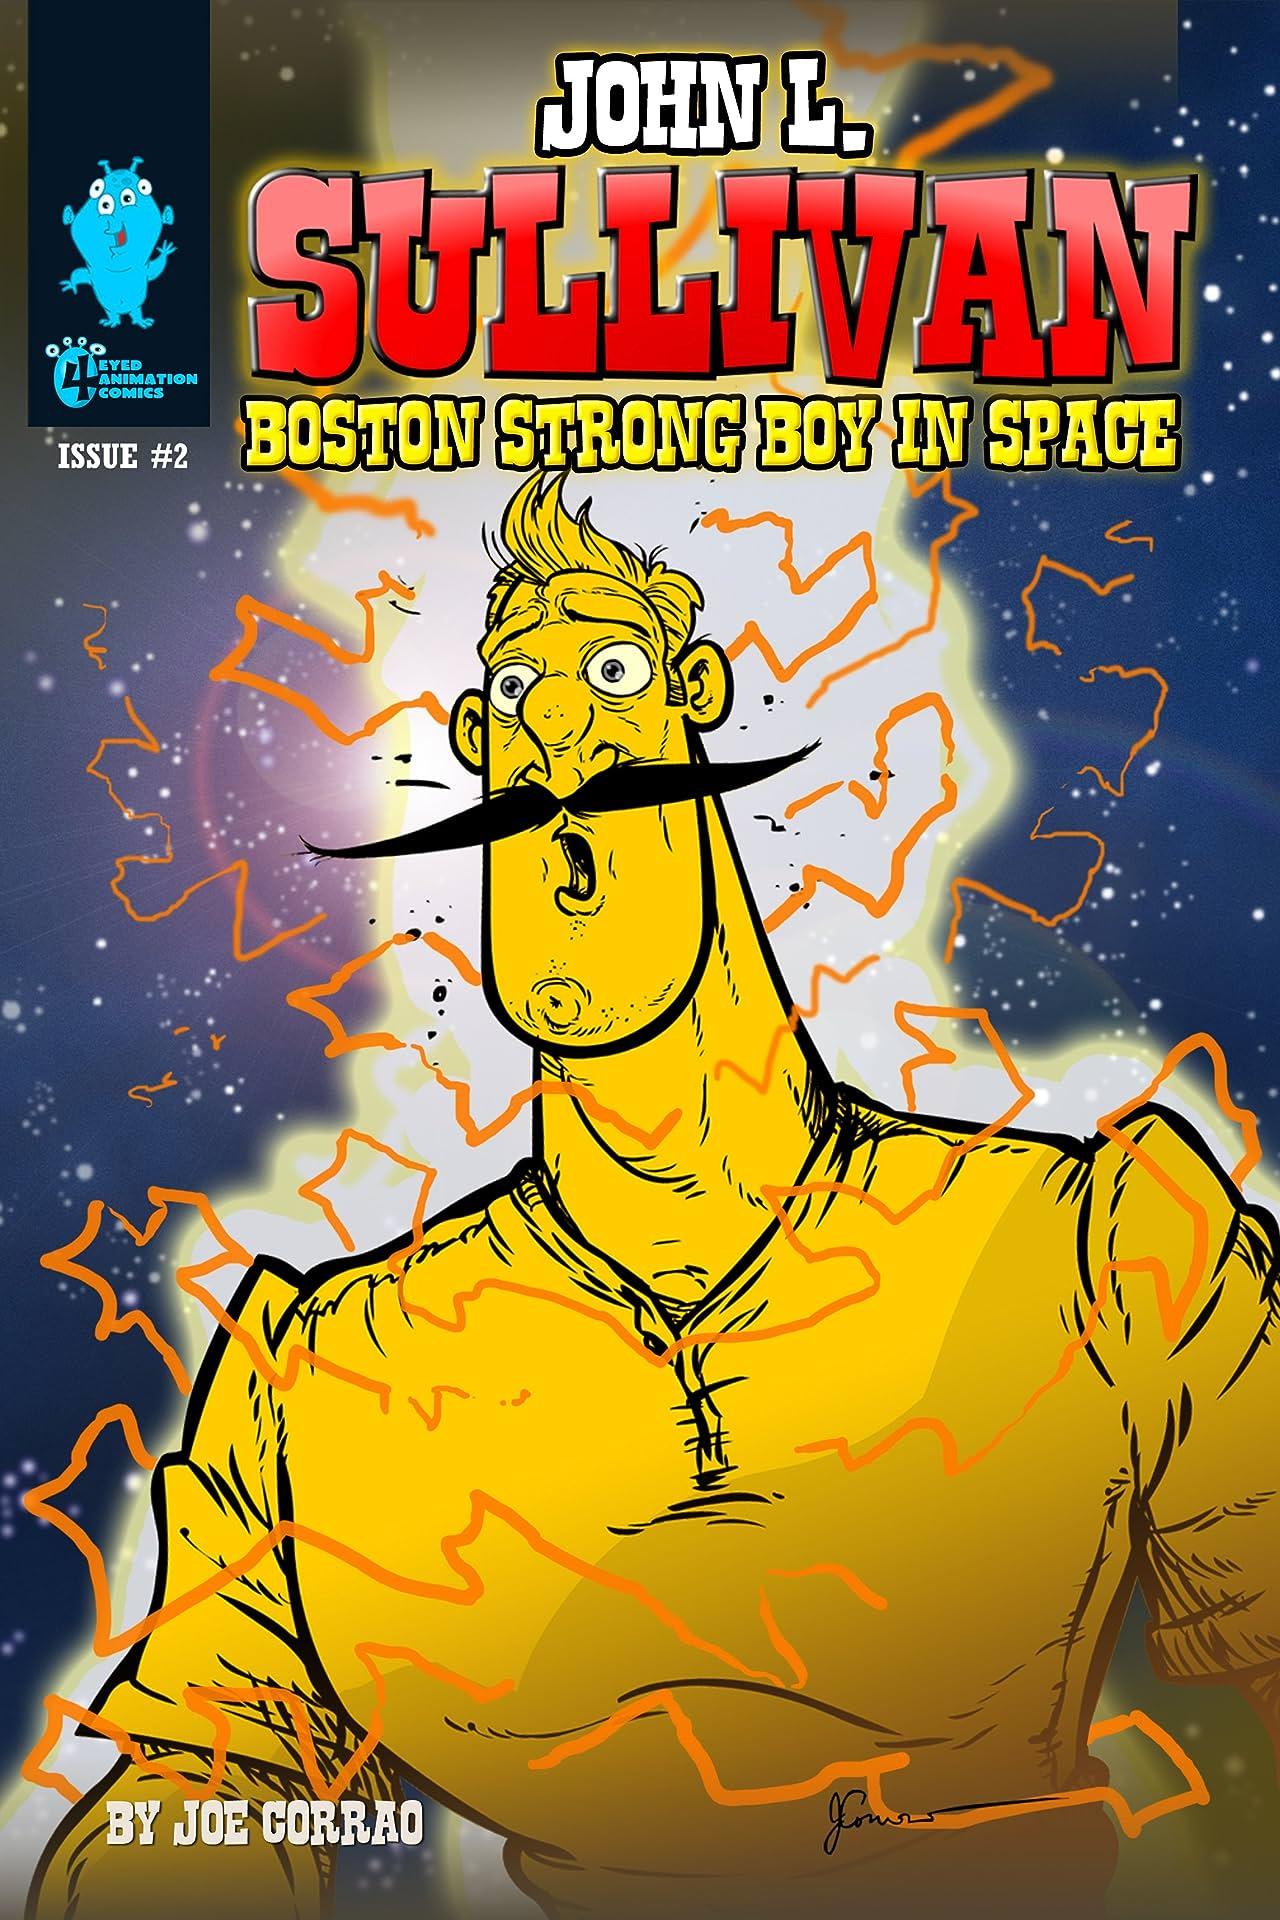 John L. Sullivan Boston Strong Boy In Space #2